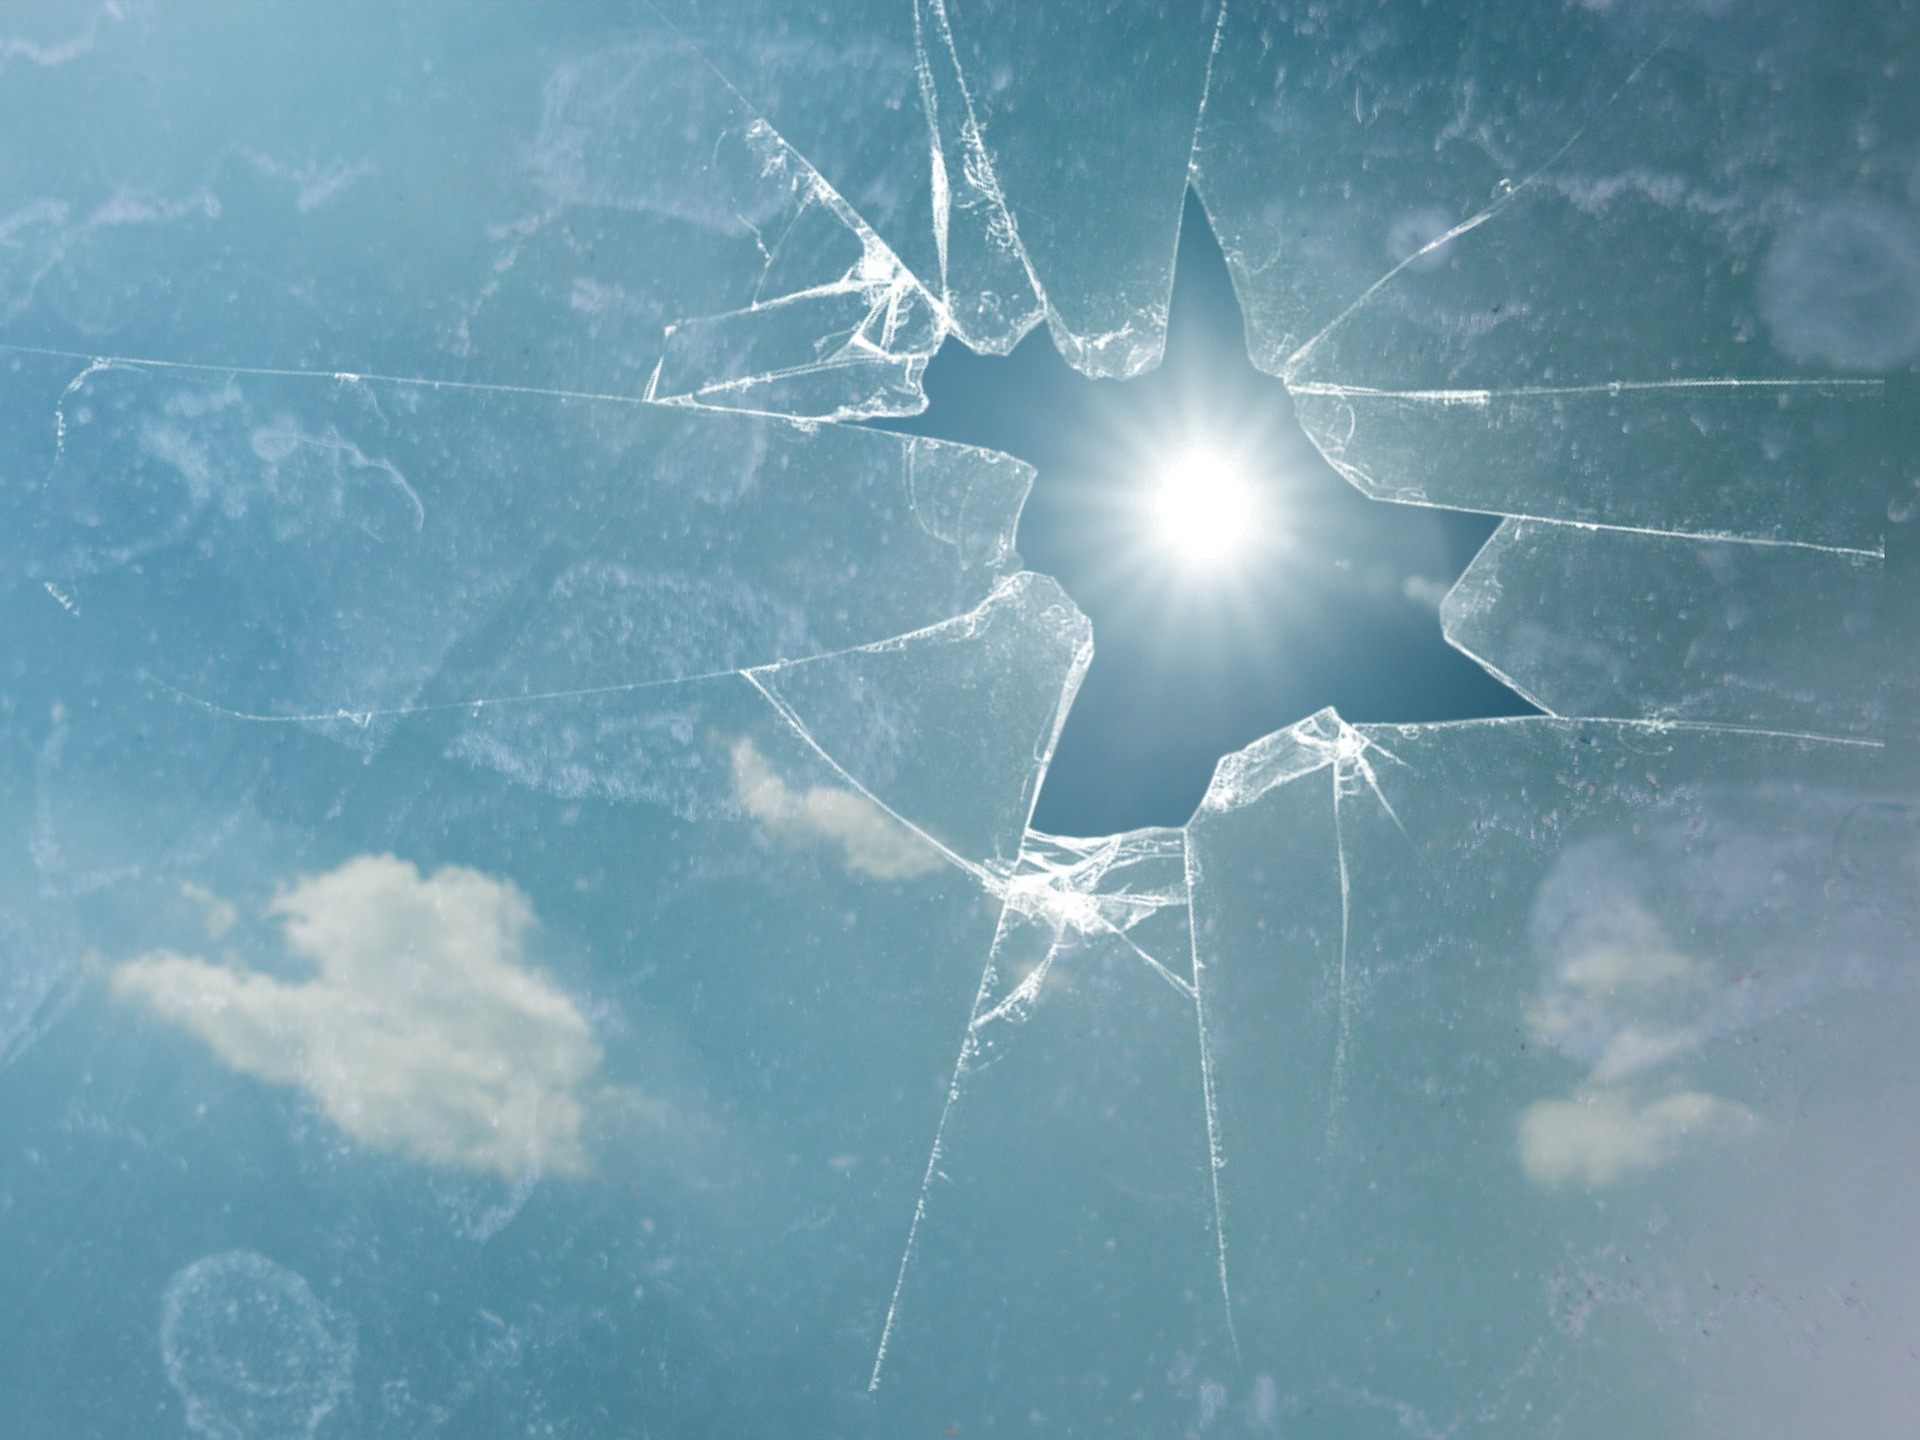 broken glass ceiling